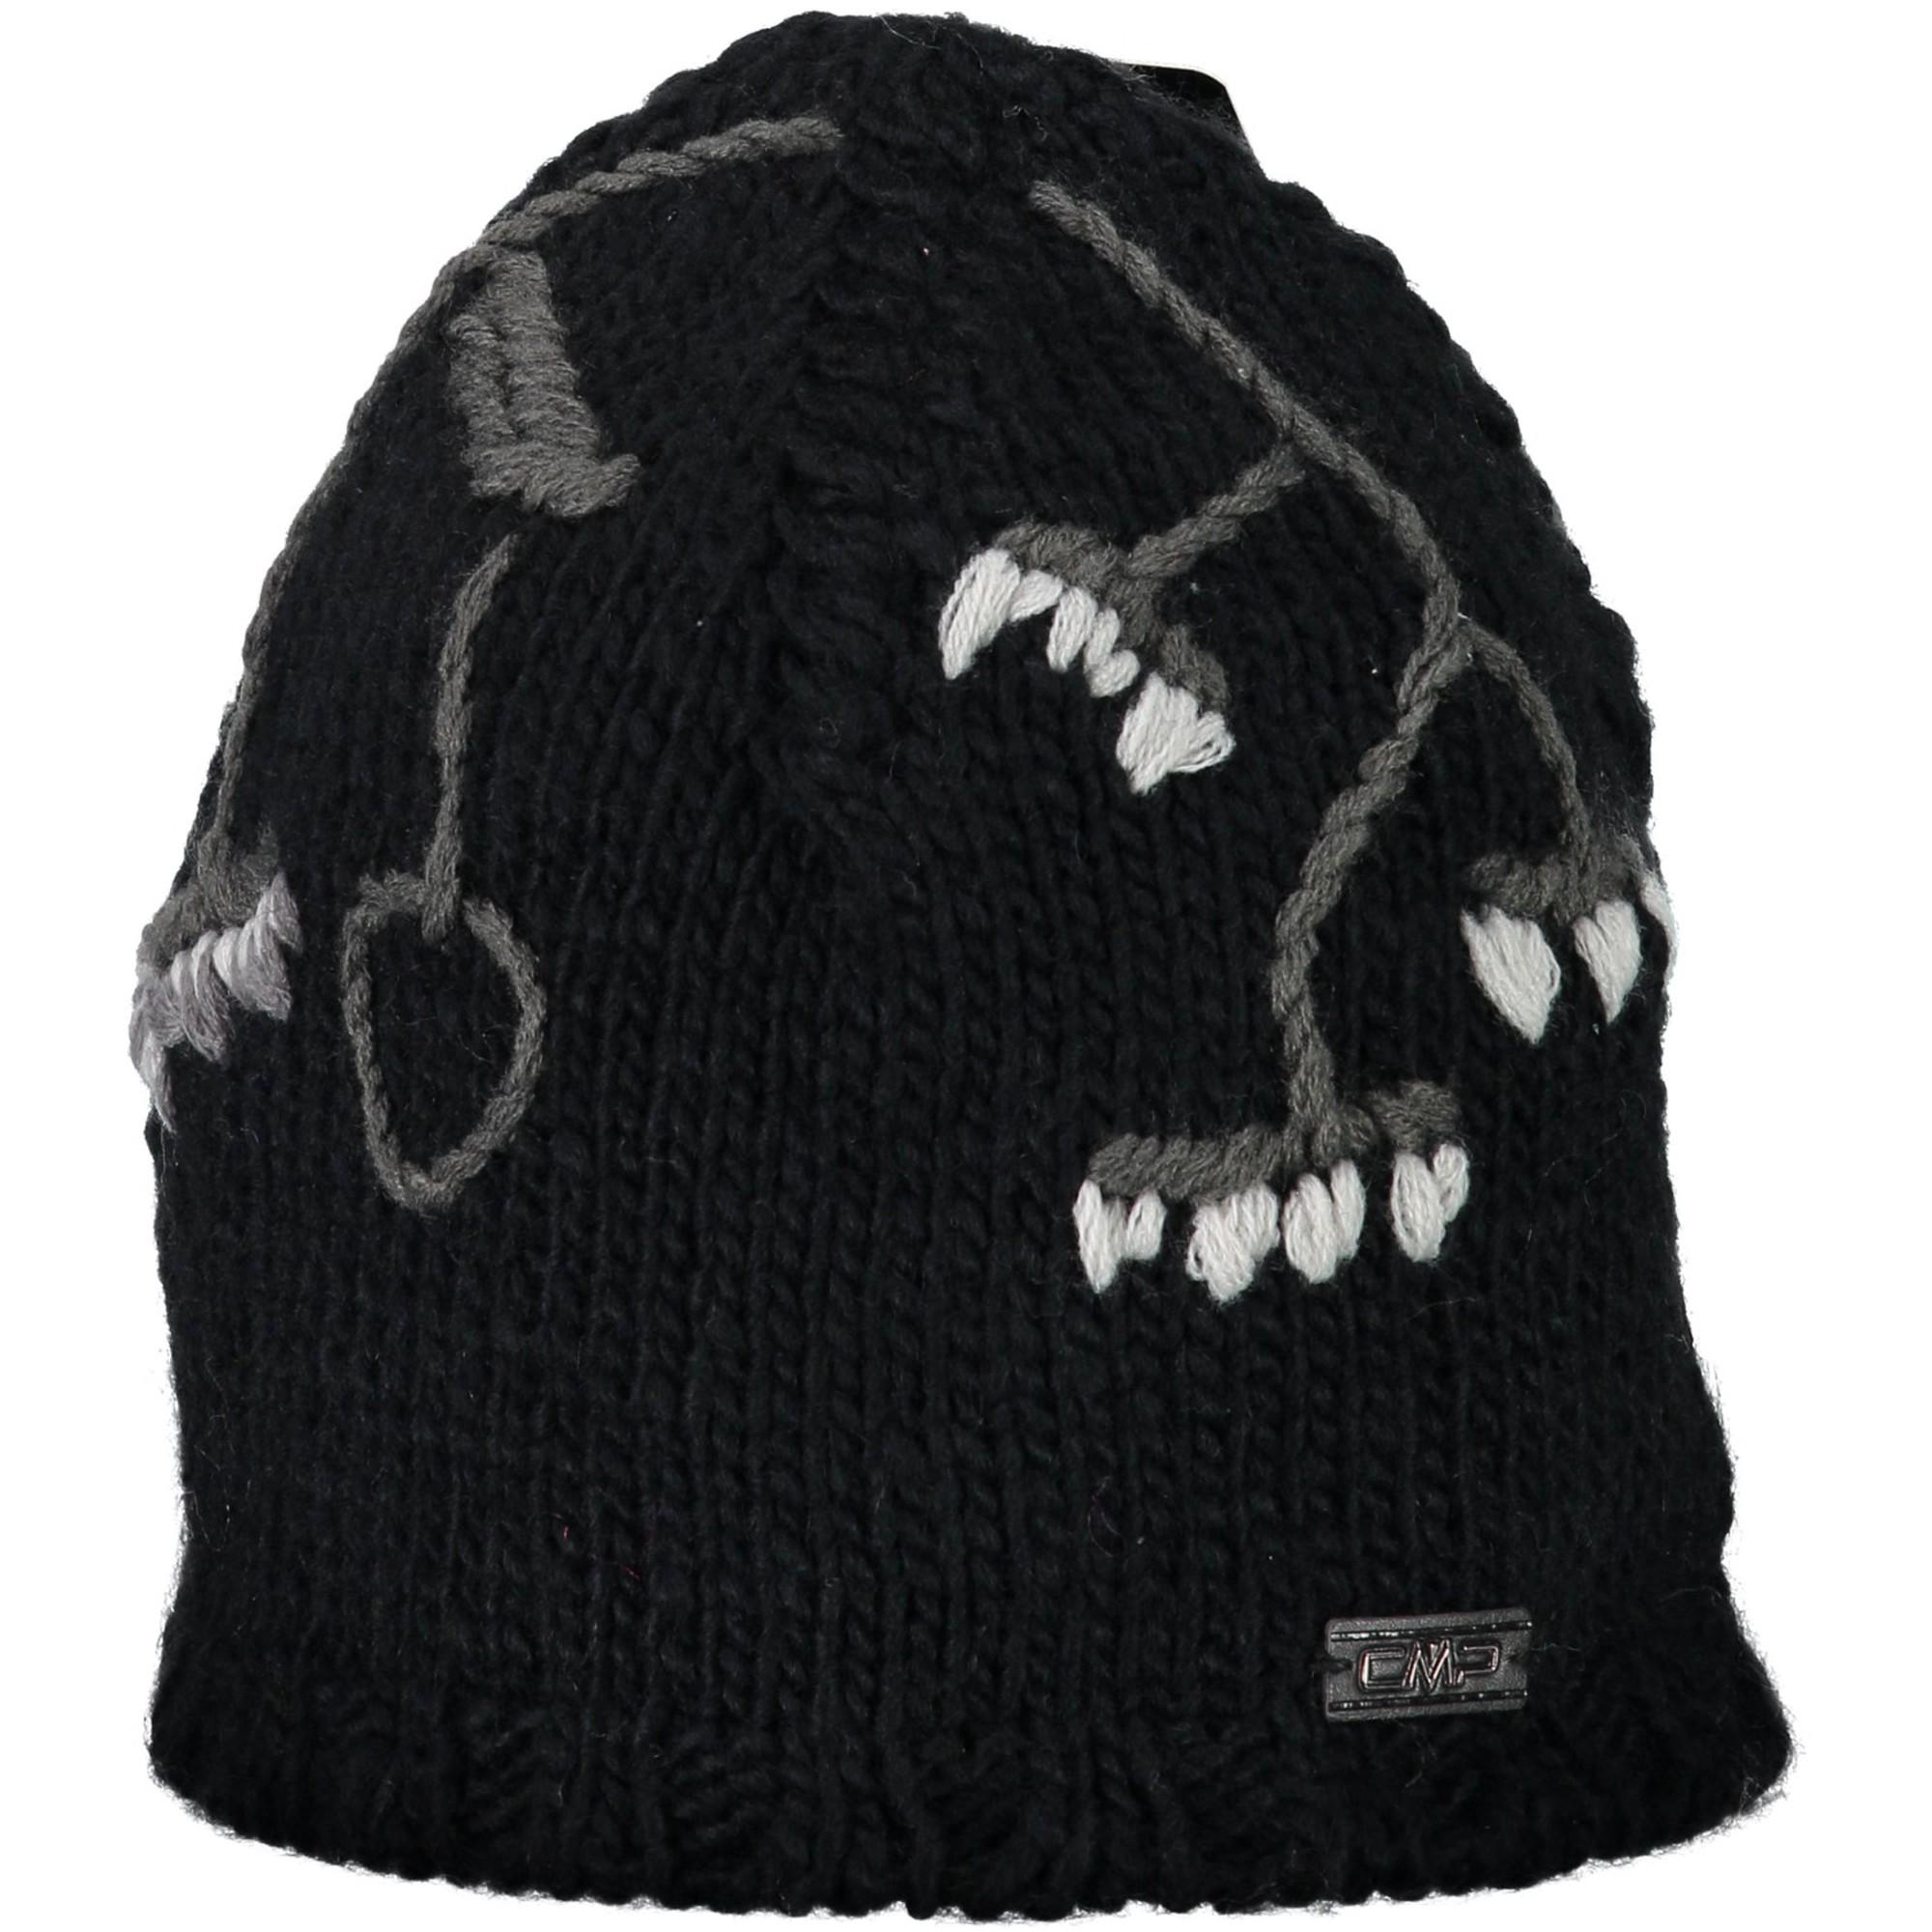 CMP Cap Beanie Woman s Knitted Hat Black Plain Fine Knit Flower  8731f32d038